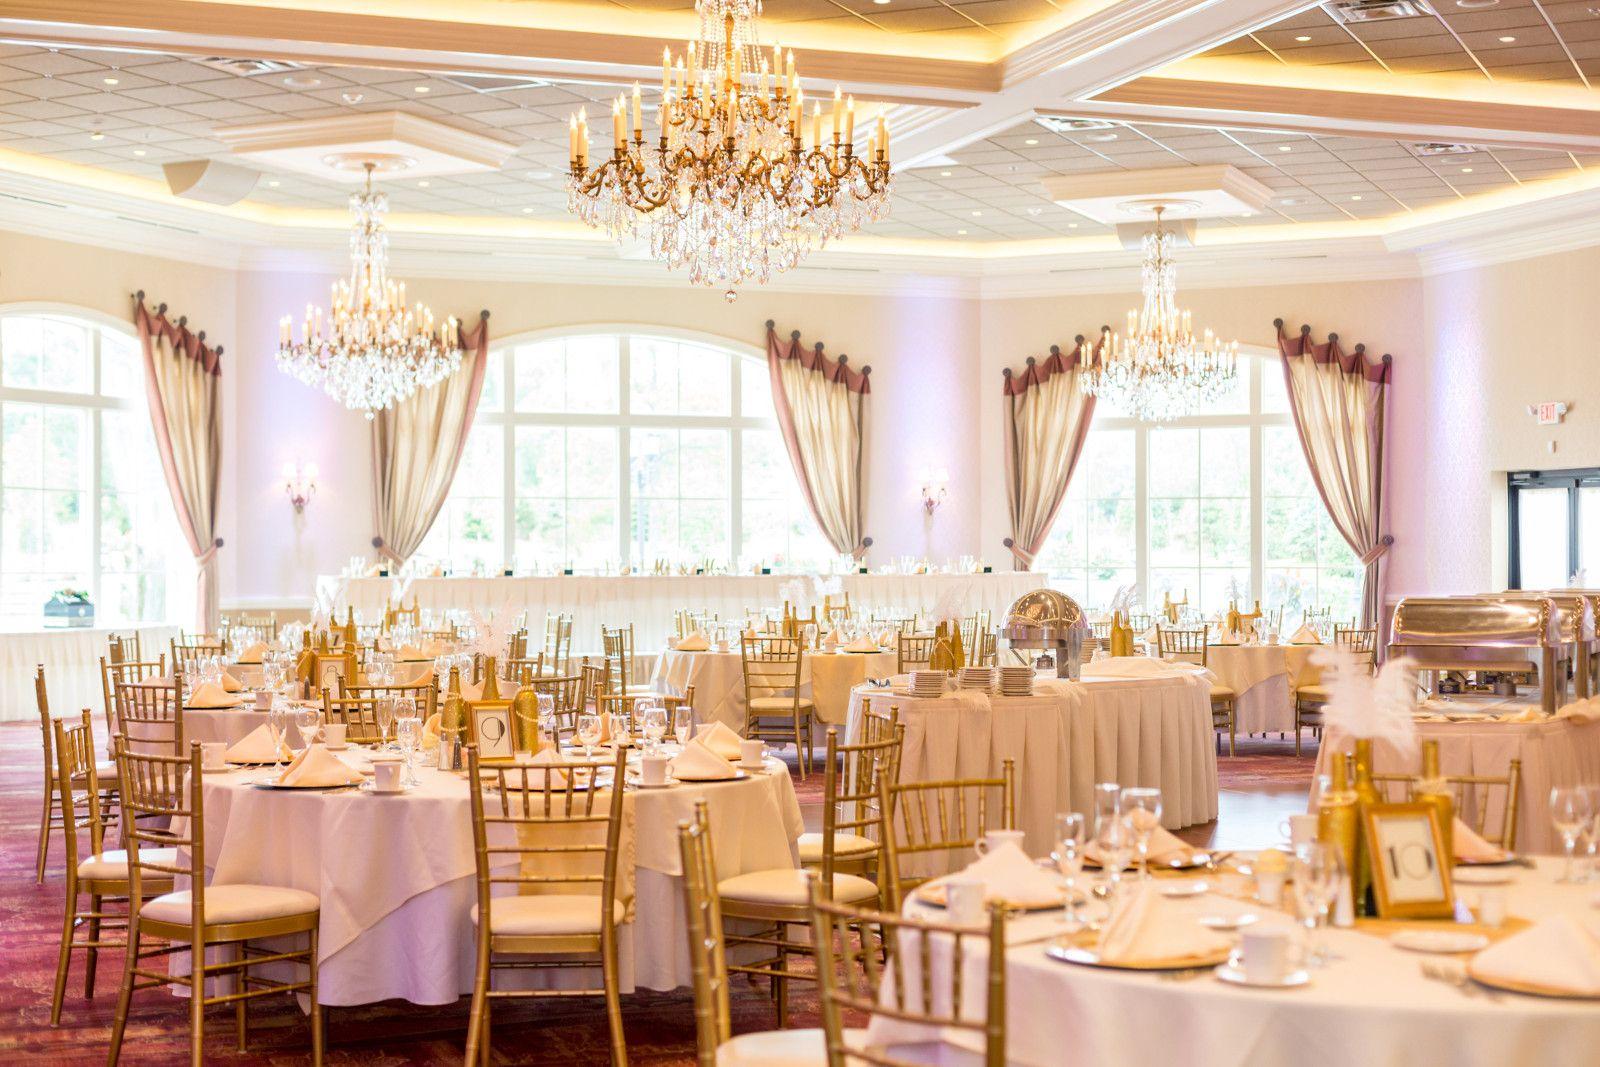 The Columns Banquet Facilities Amp Wedding Venue In